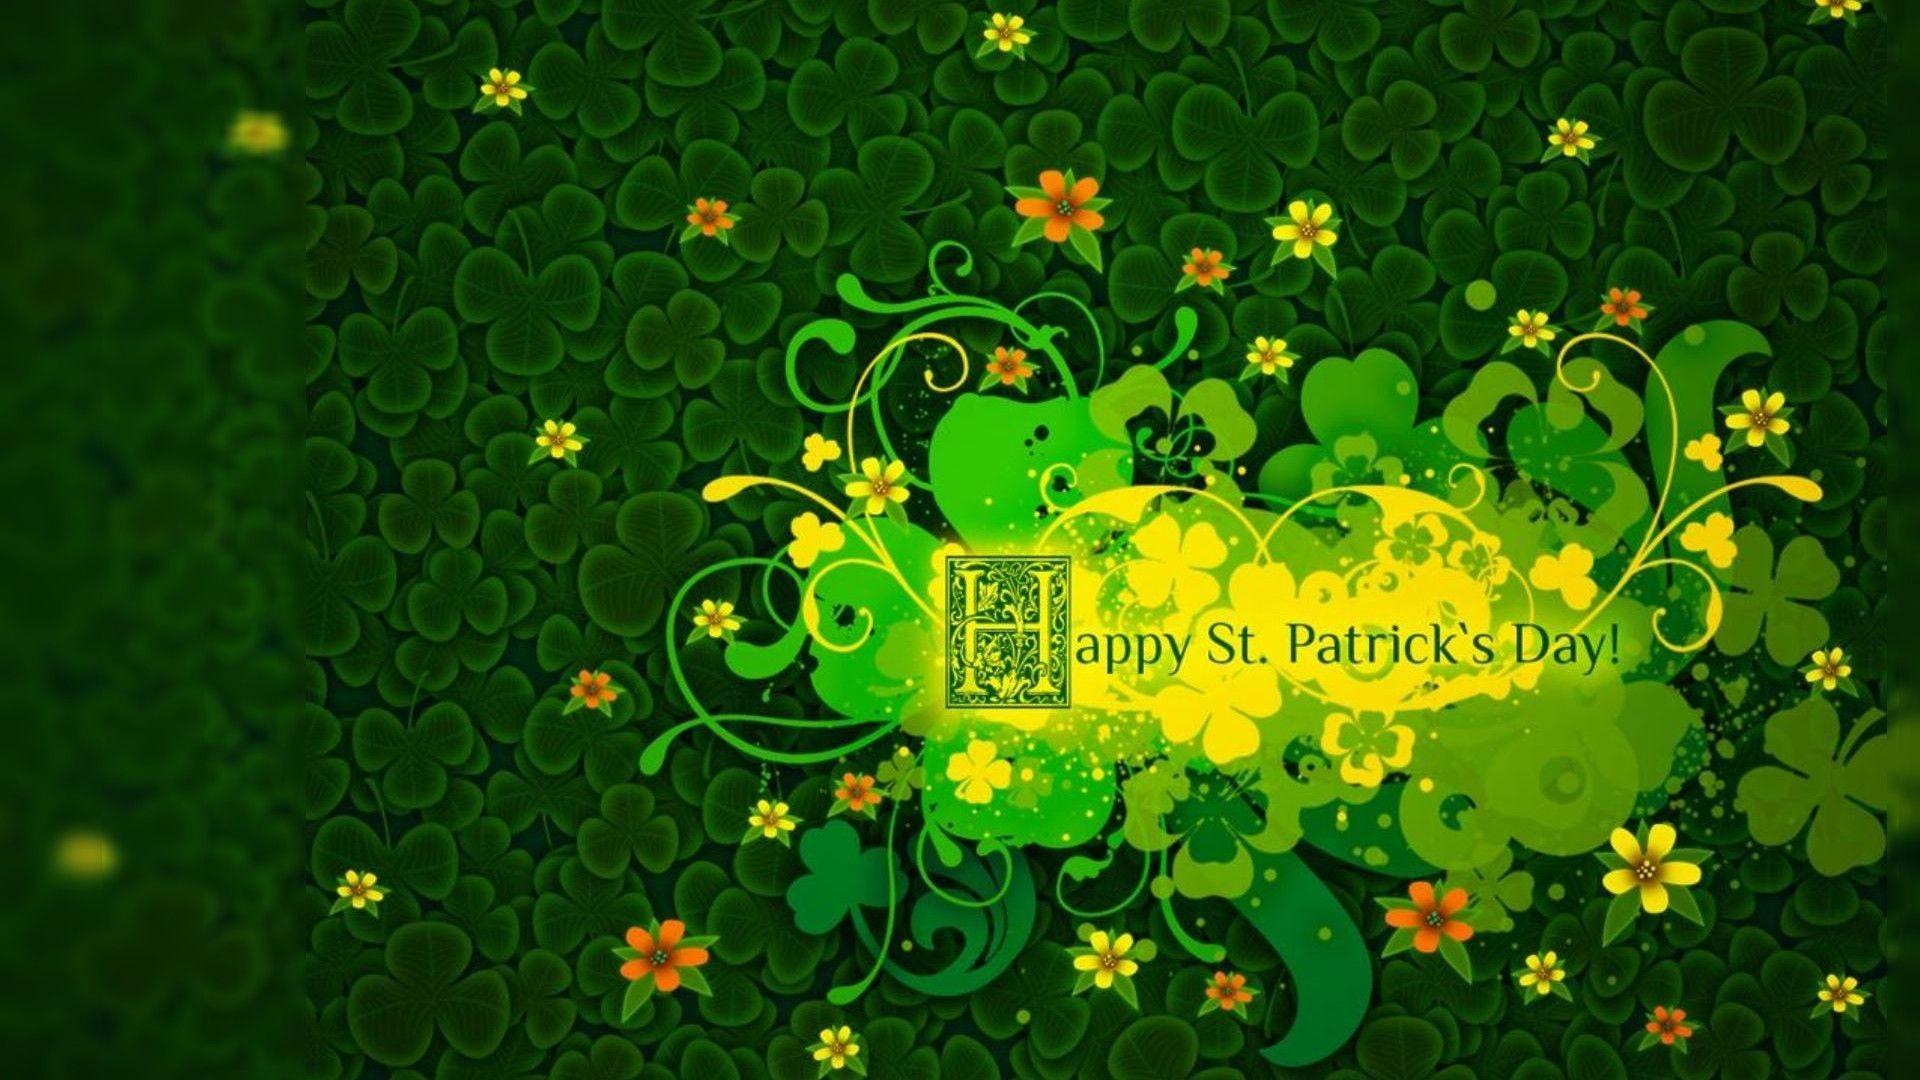 Free Desktop Wallpaper St Patricks Day